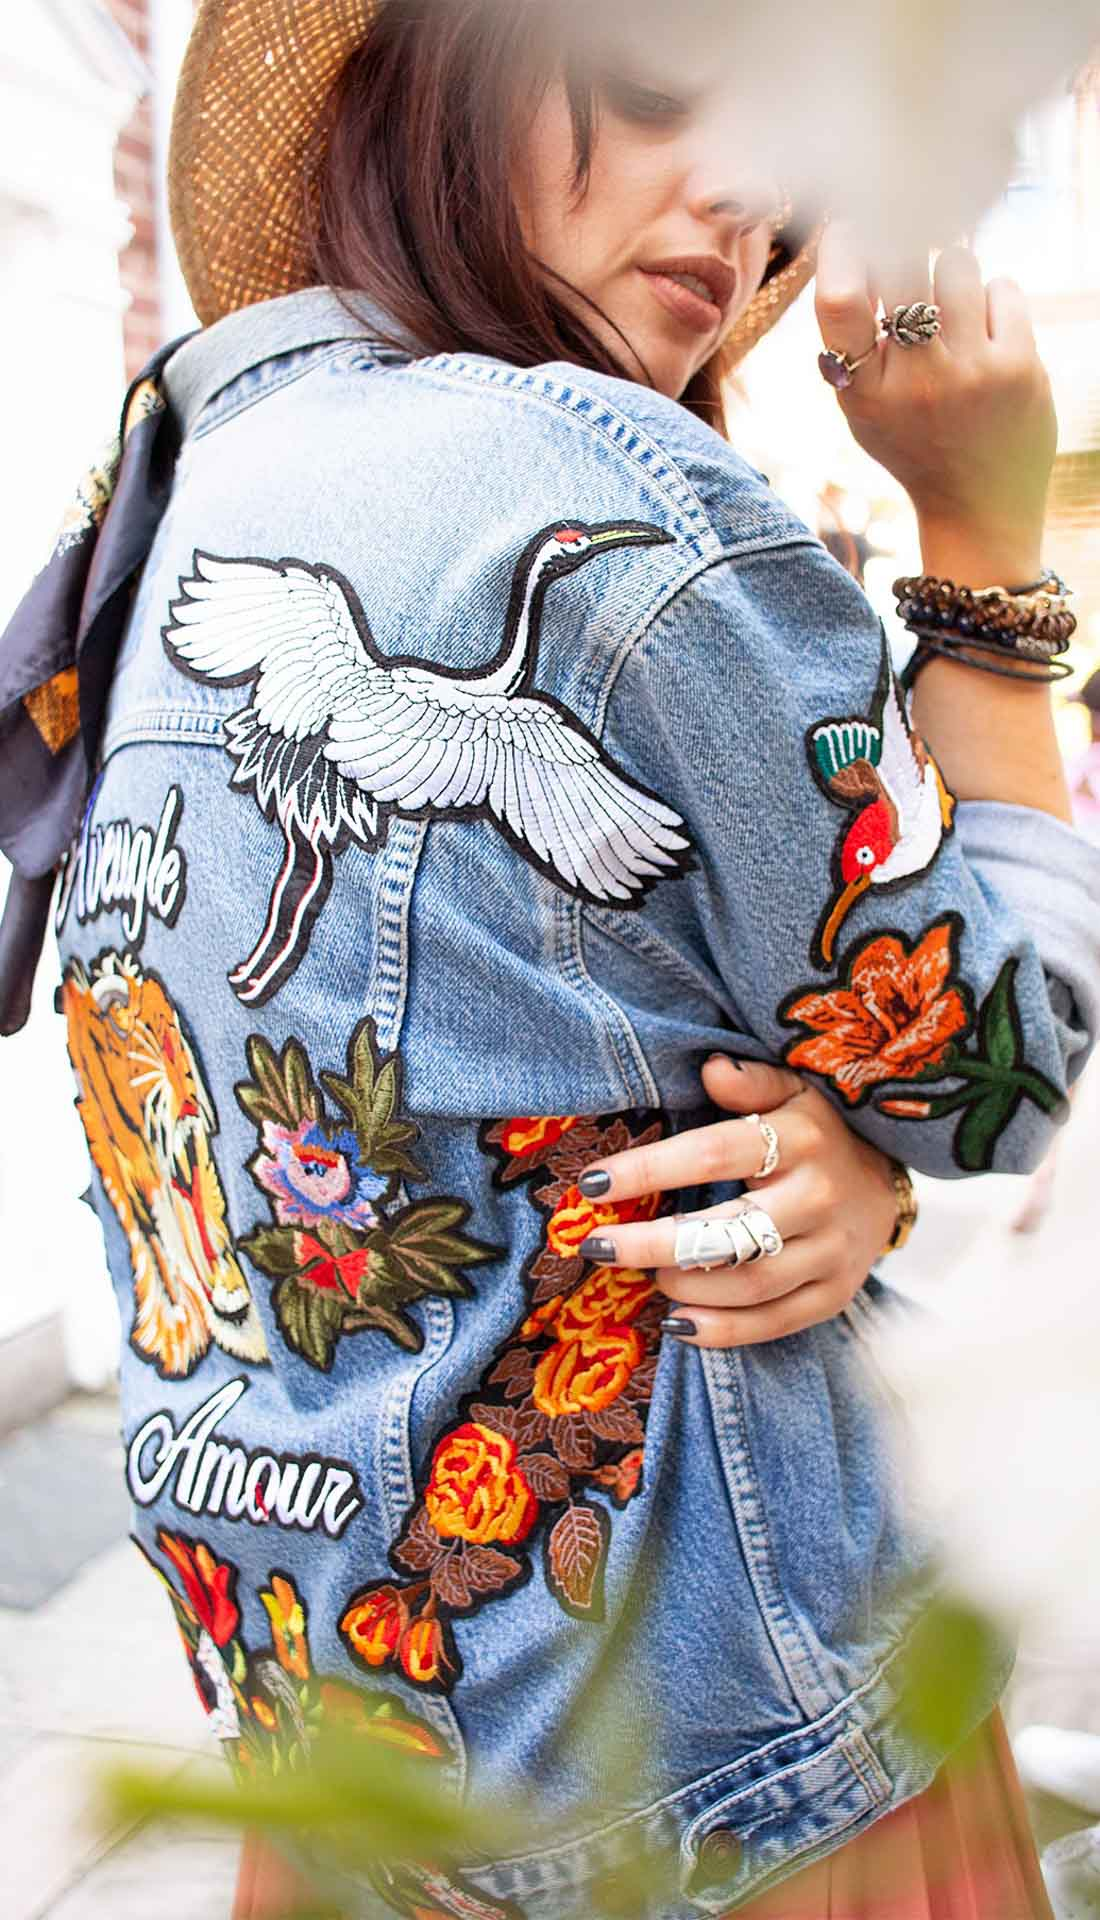 Denim fashion photoshoot, denim jacket with patches, fashion photographer Birmingham